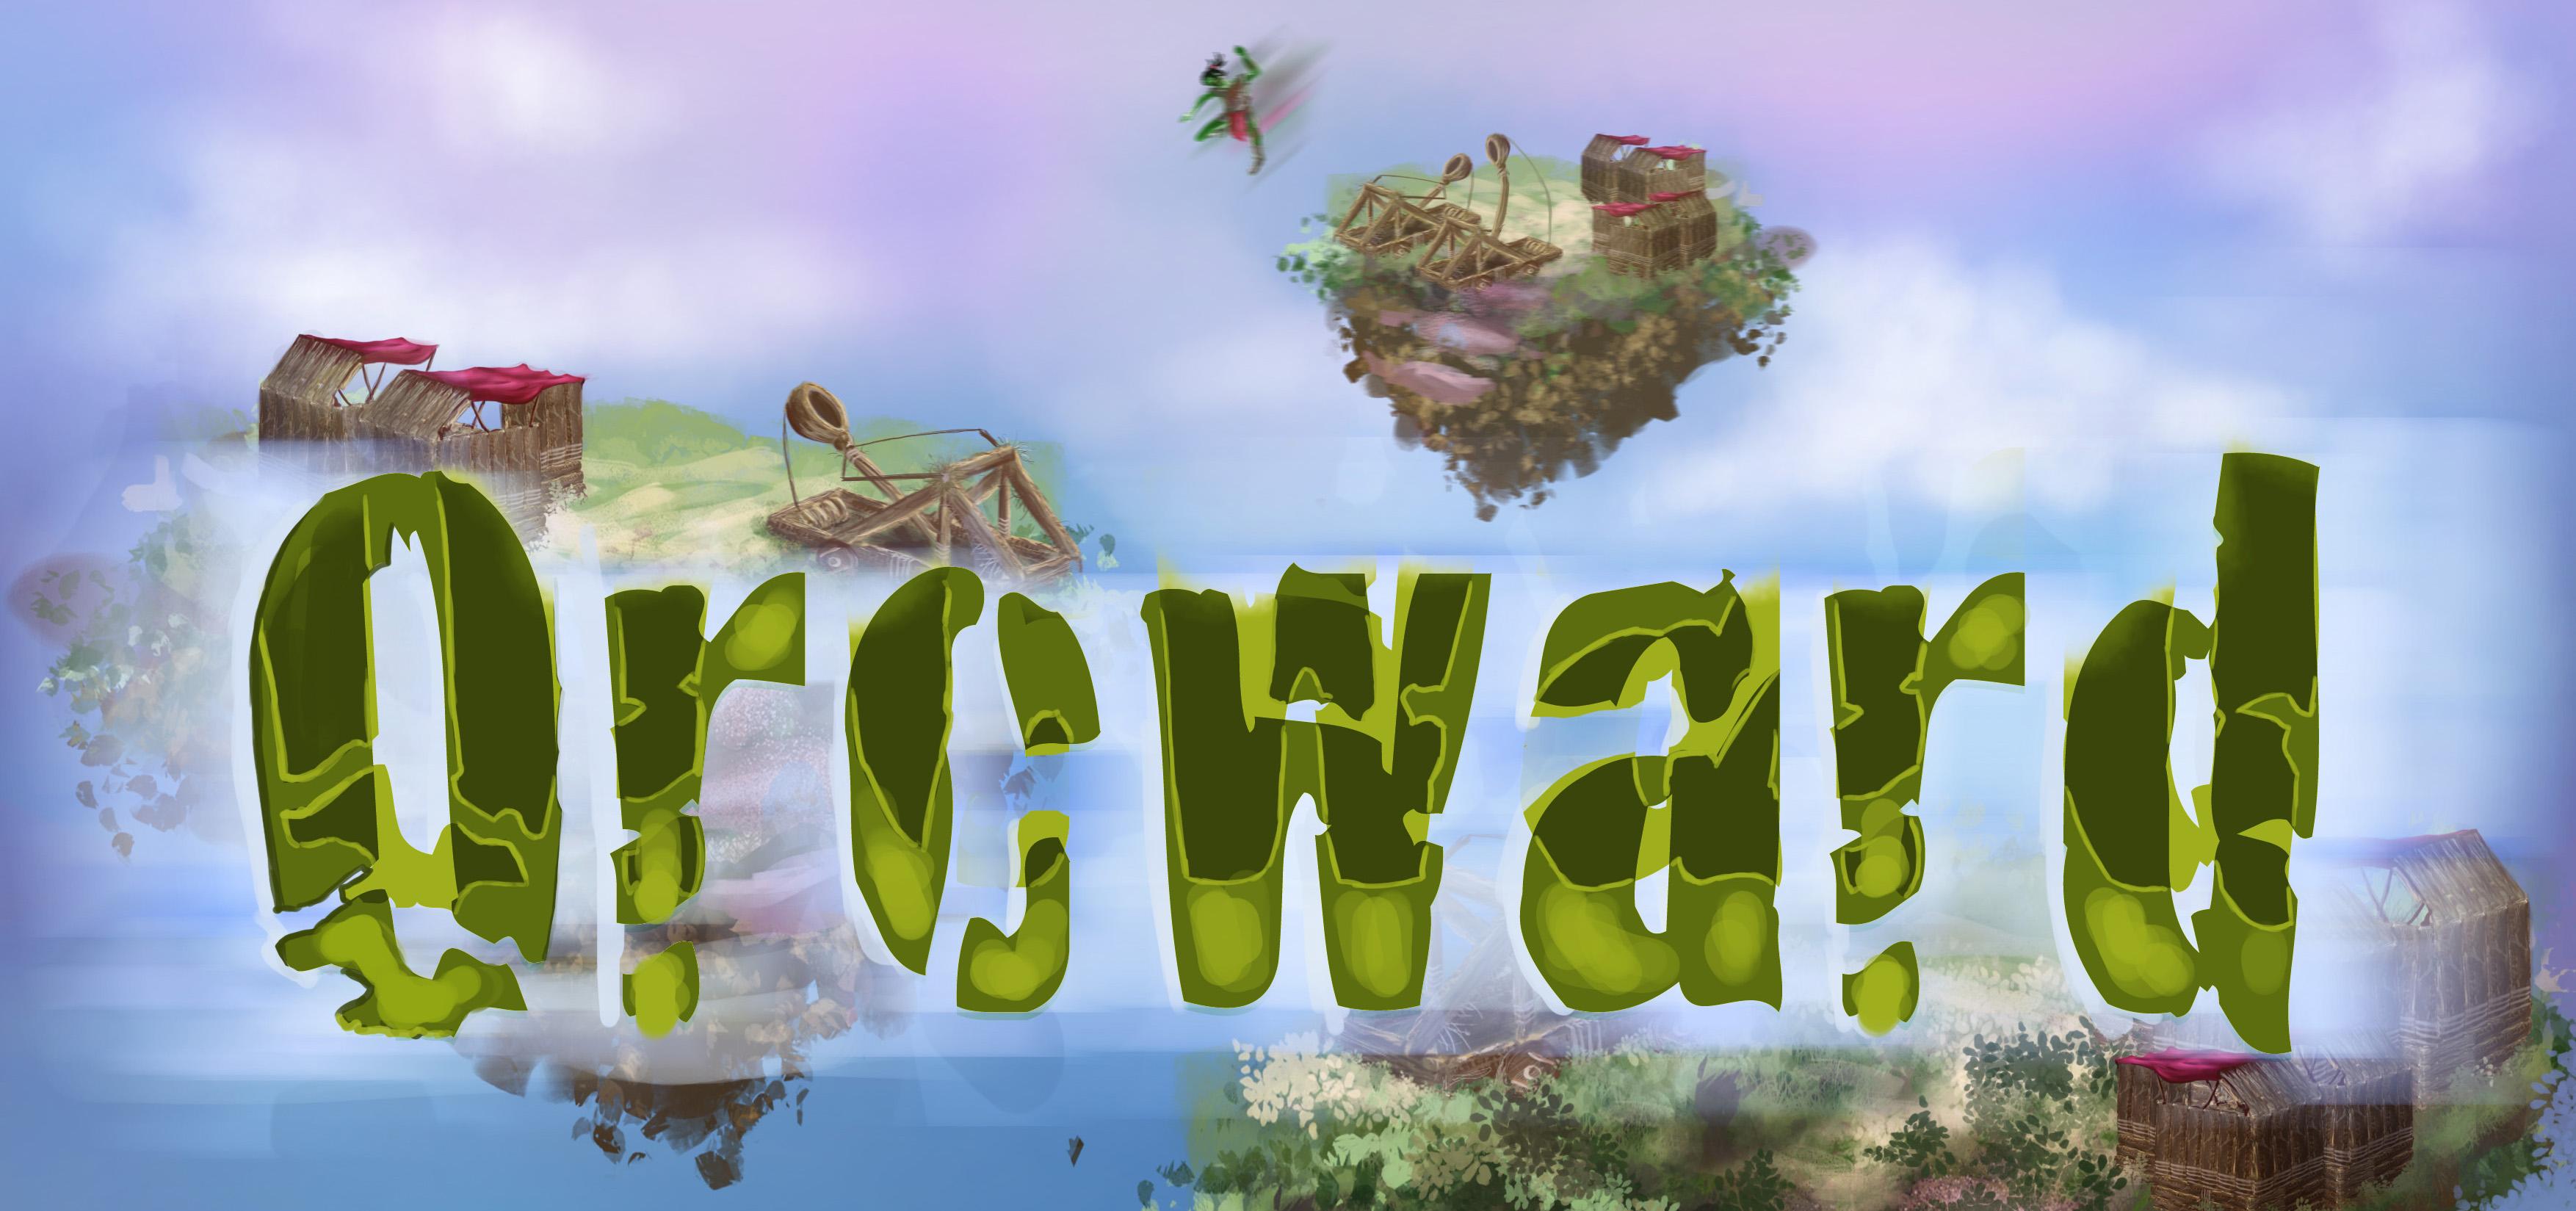 Orcward